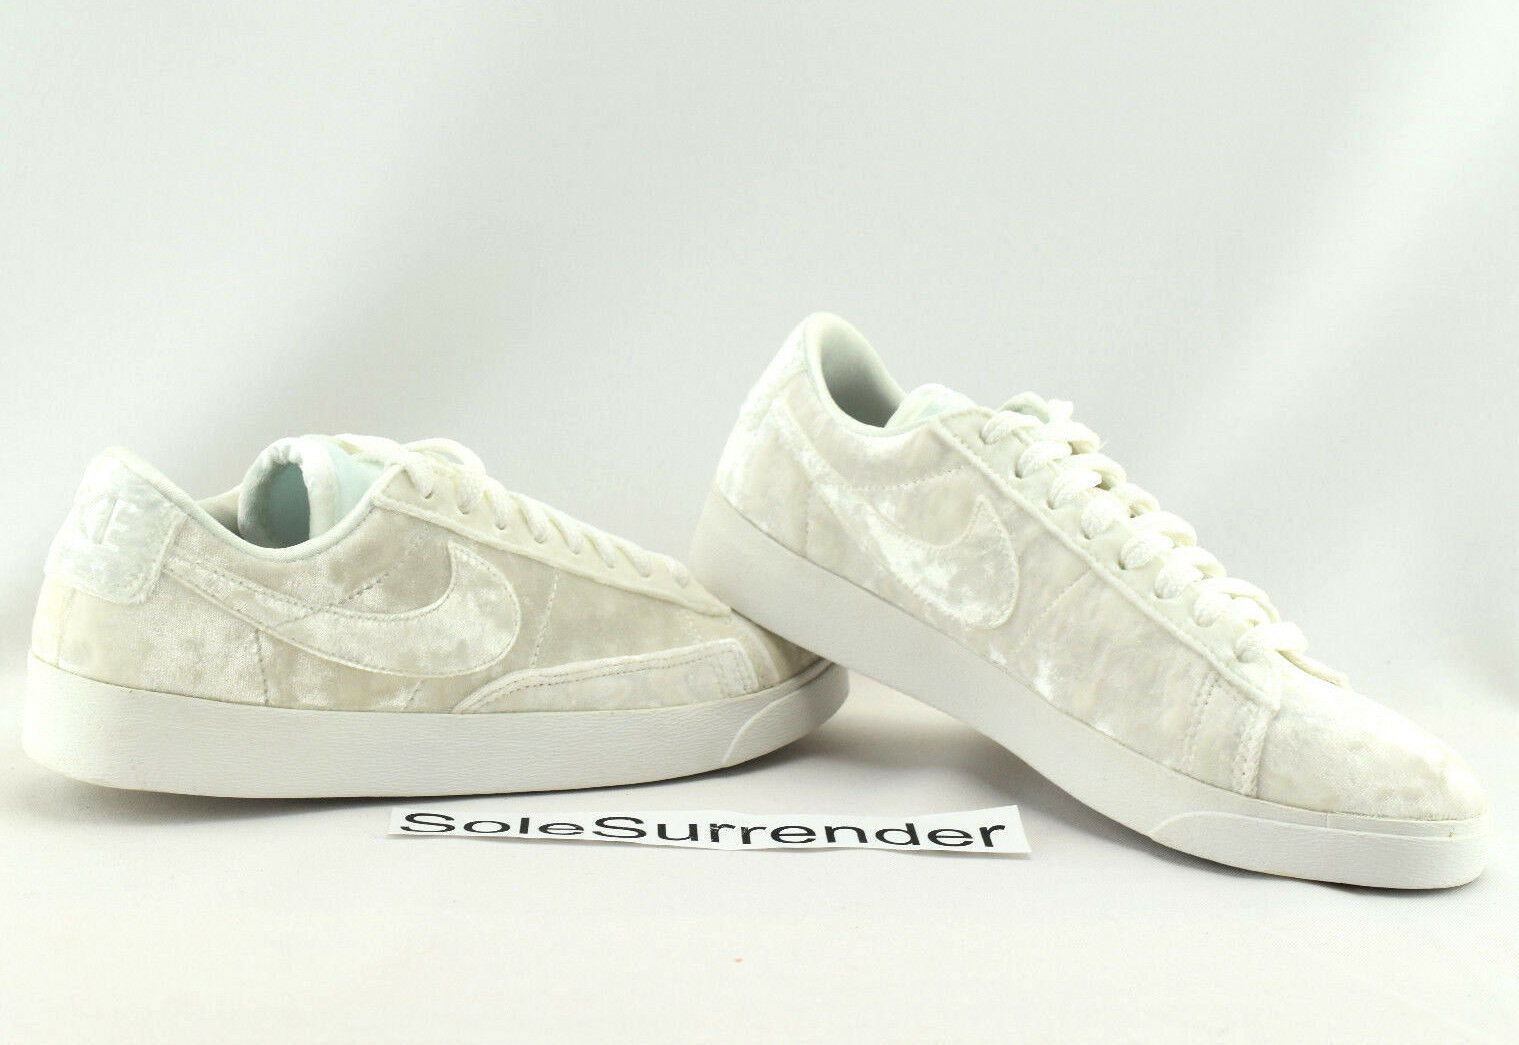 Women's Nike Blazer Low Lux - SIZE 7.5 - LX Triple Whiteout Velvet